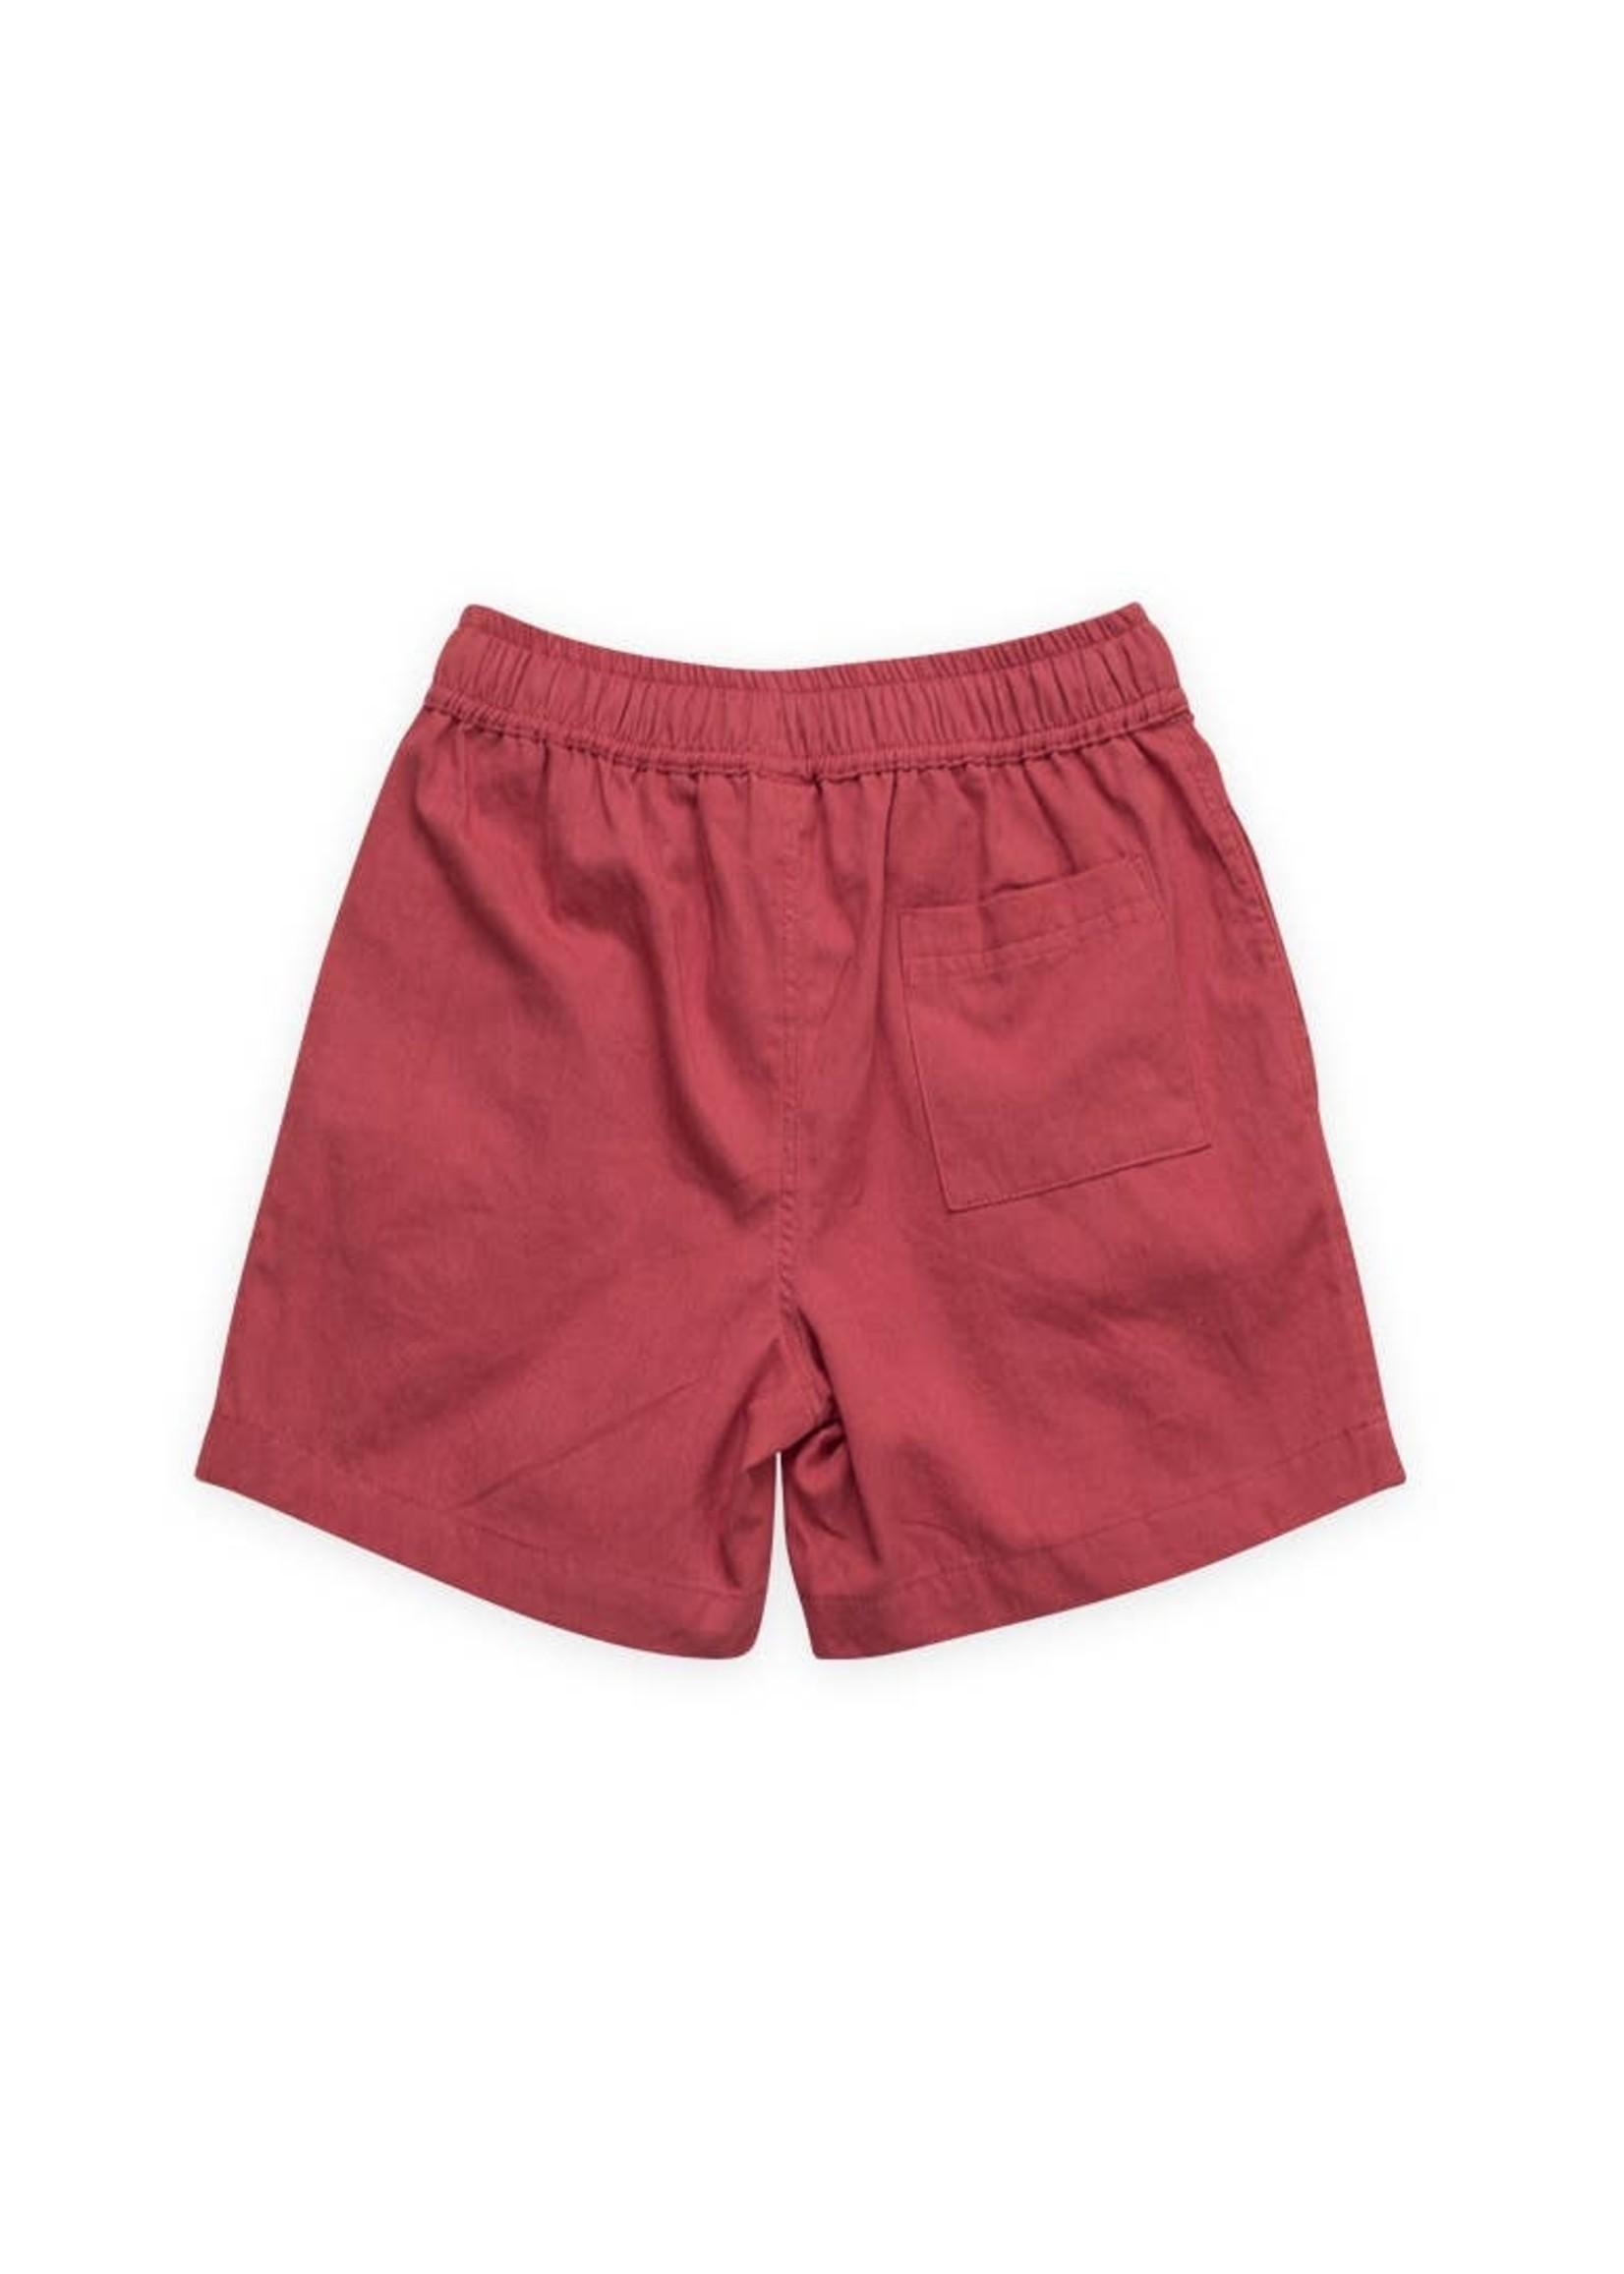 beet world Pull on Shorts